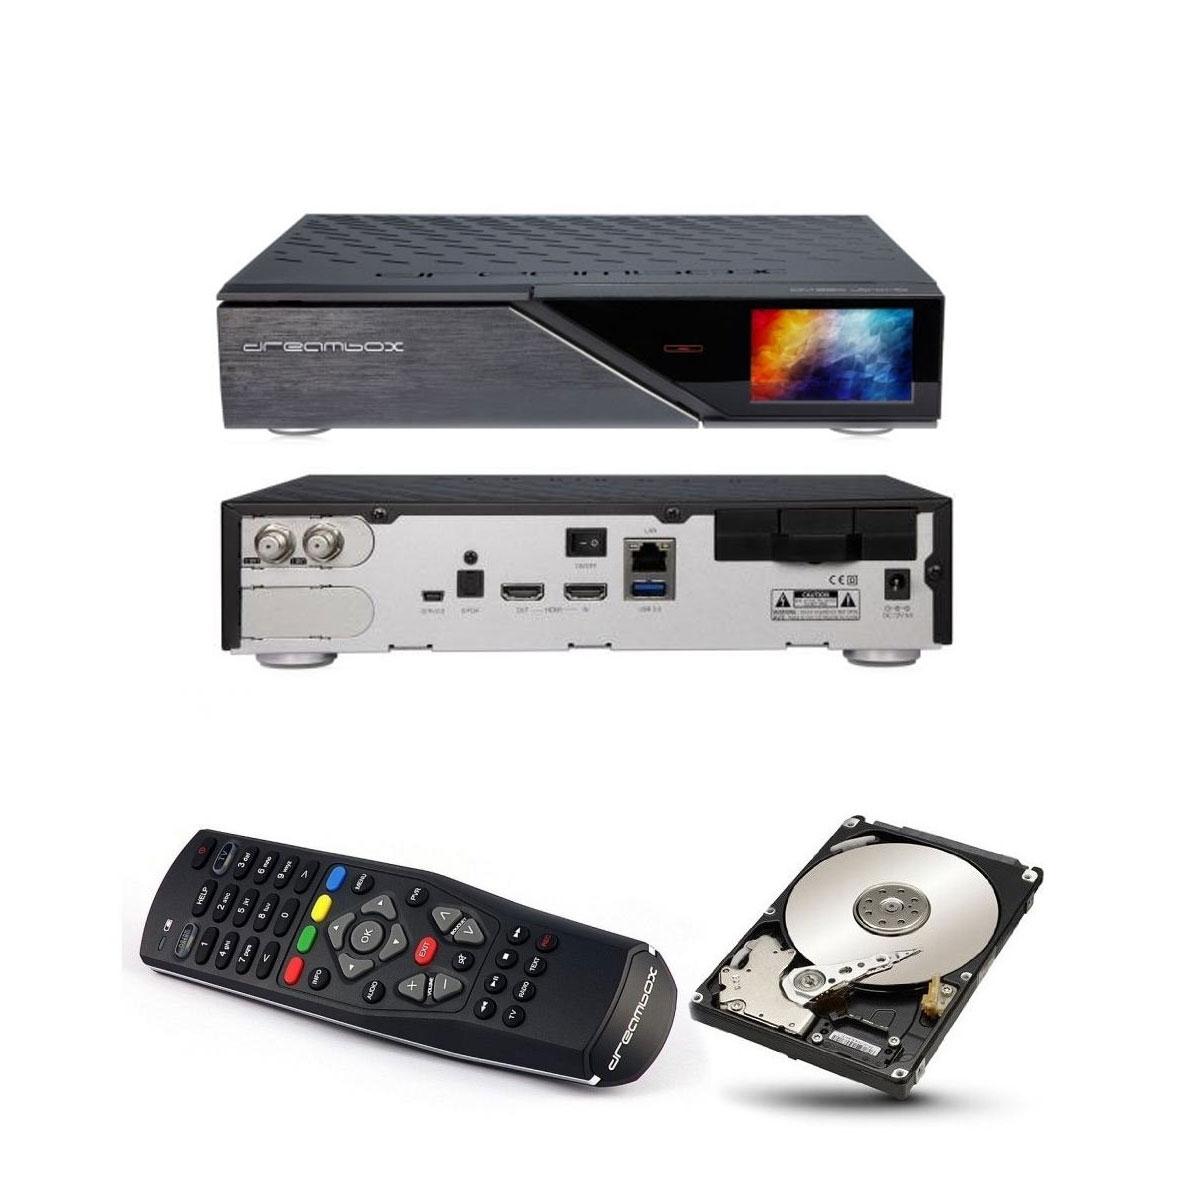 Dreambox DM 920 UHD 4K 1x Dual DVB-S2 FBC Tuner E2 Linux PVR Receiver + 2TB HDD Festplatte